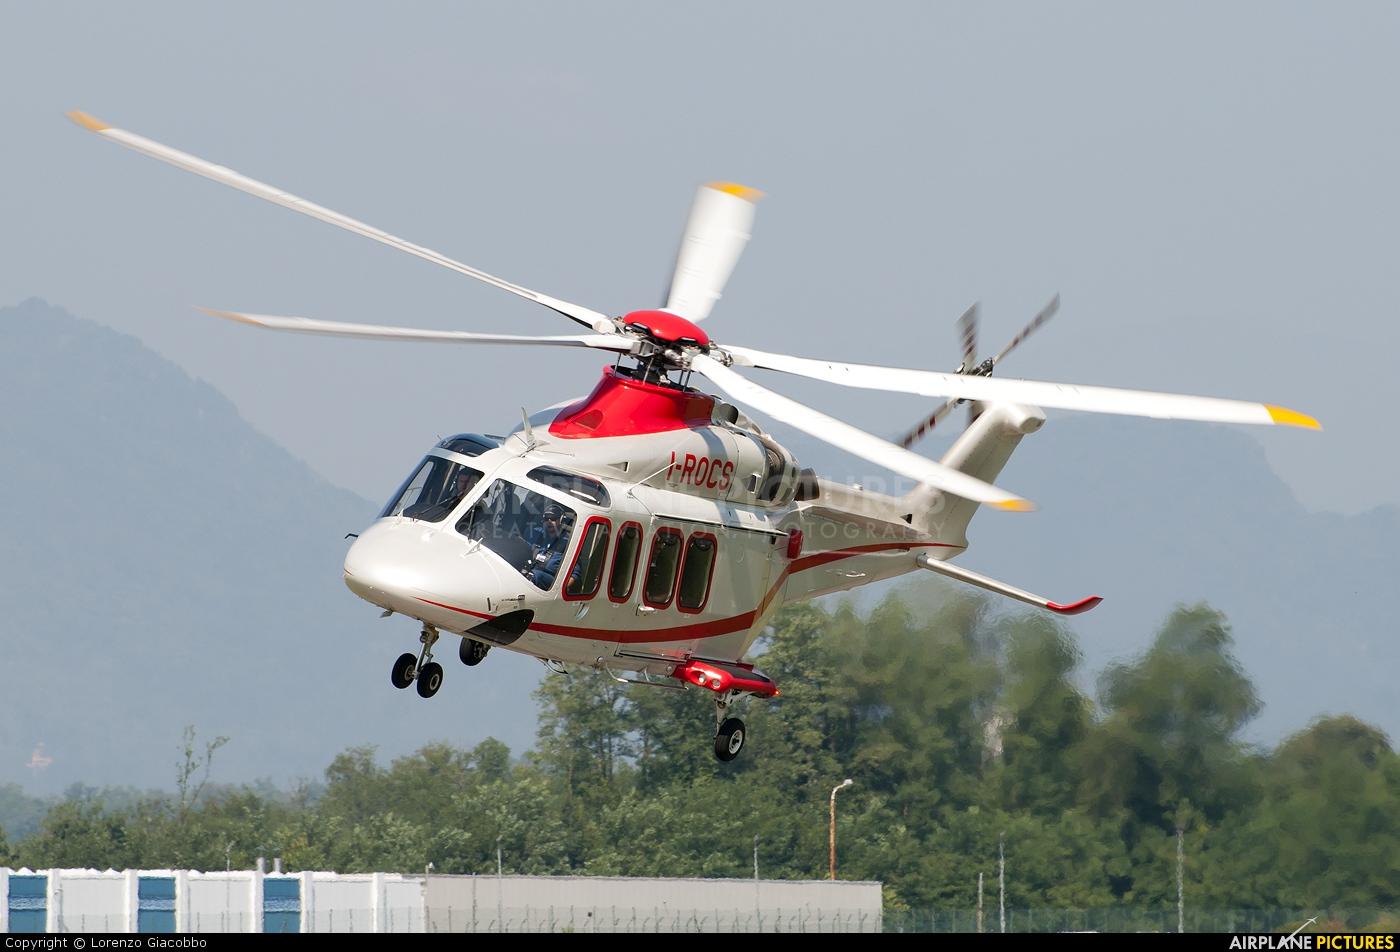 Agusta Westland I-ROCS aircraft at Venegono